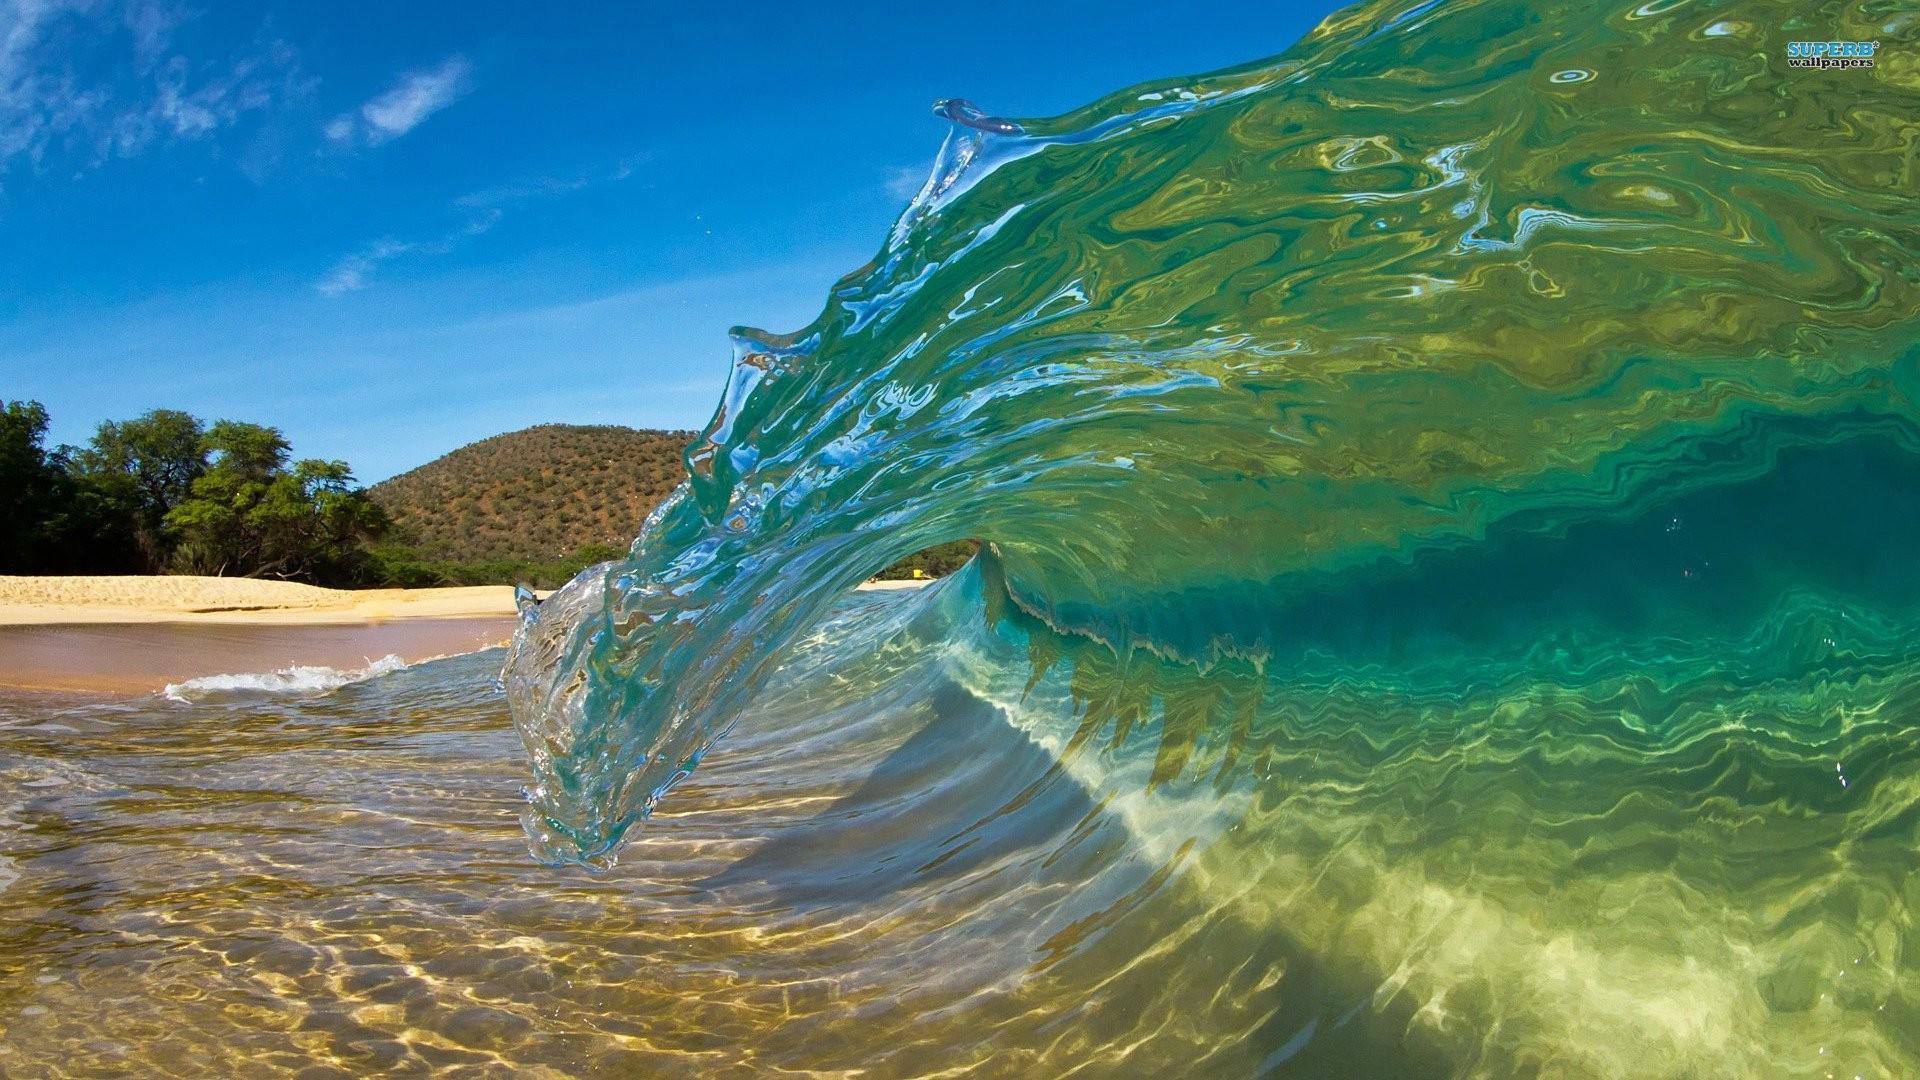 Hd Wave Wallpaper 74 Images